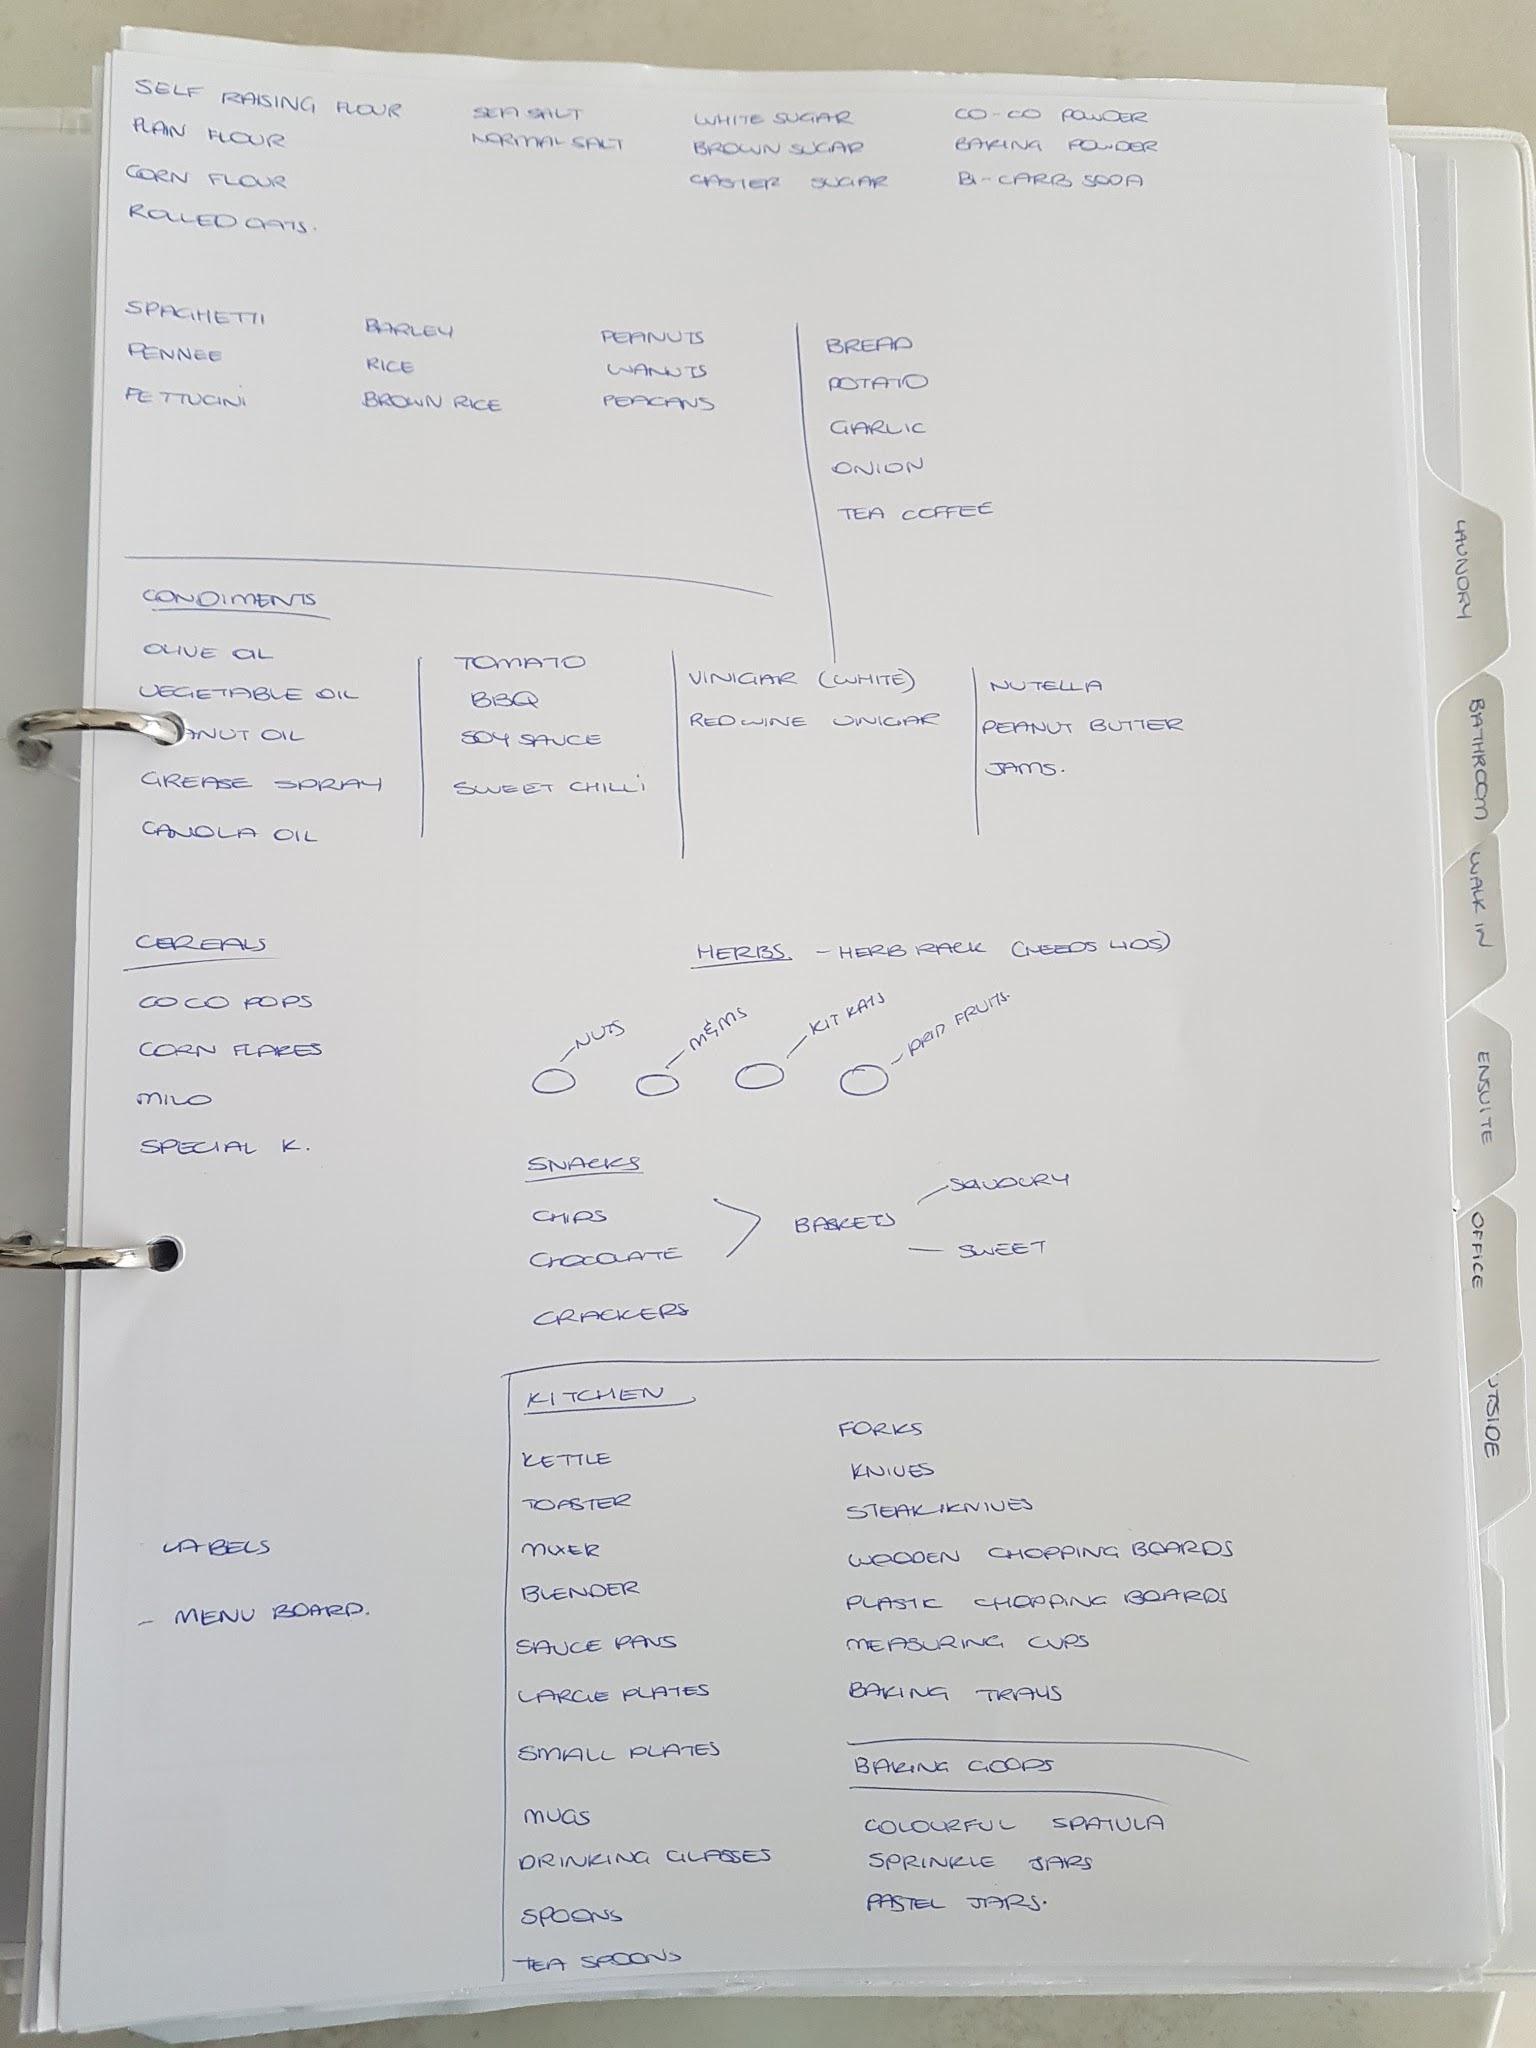 Draft Shopping List